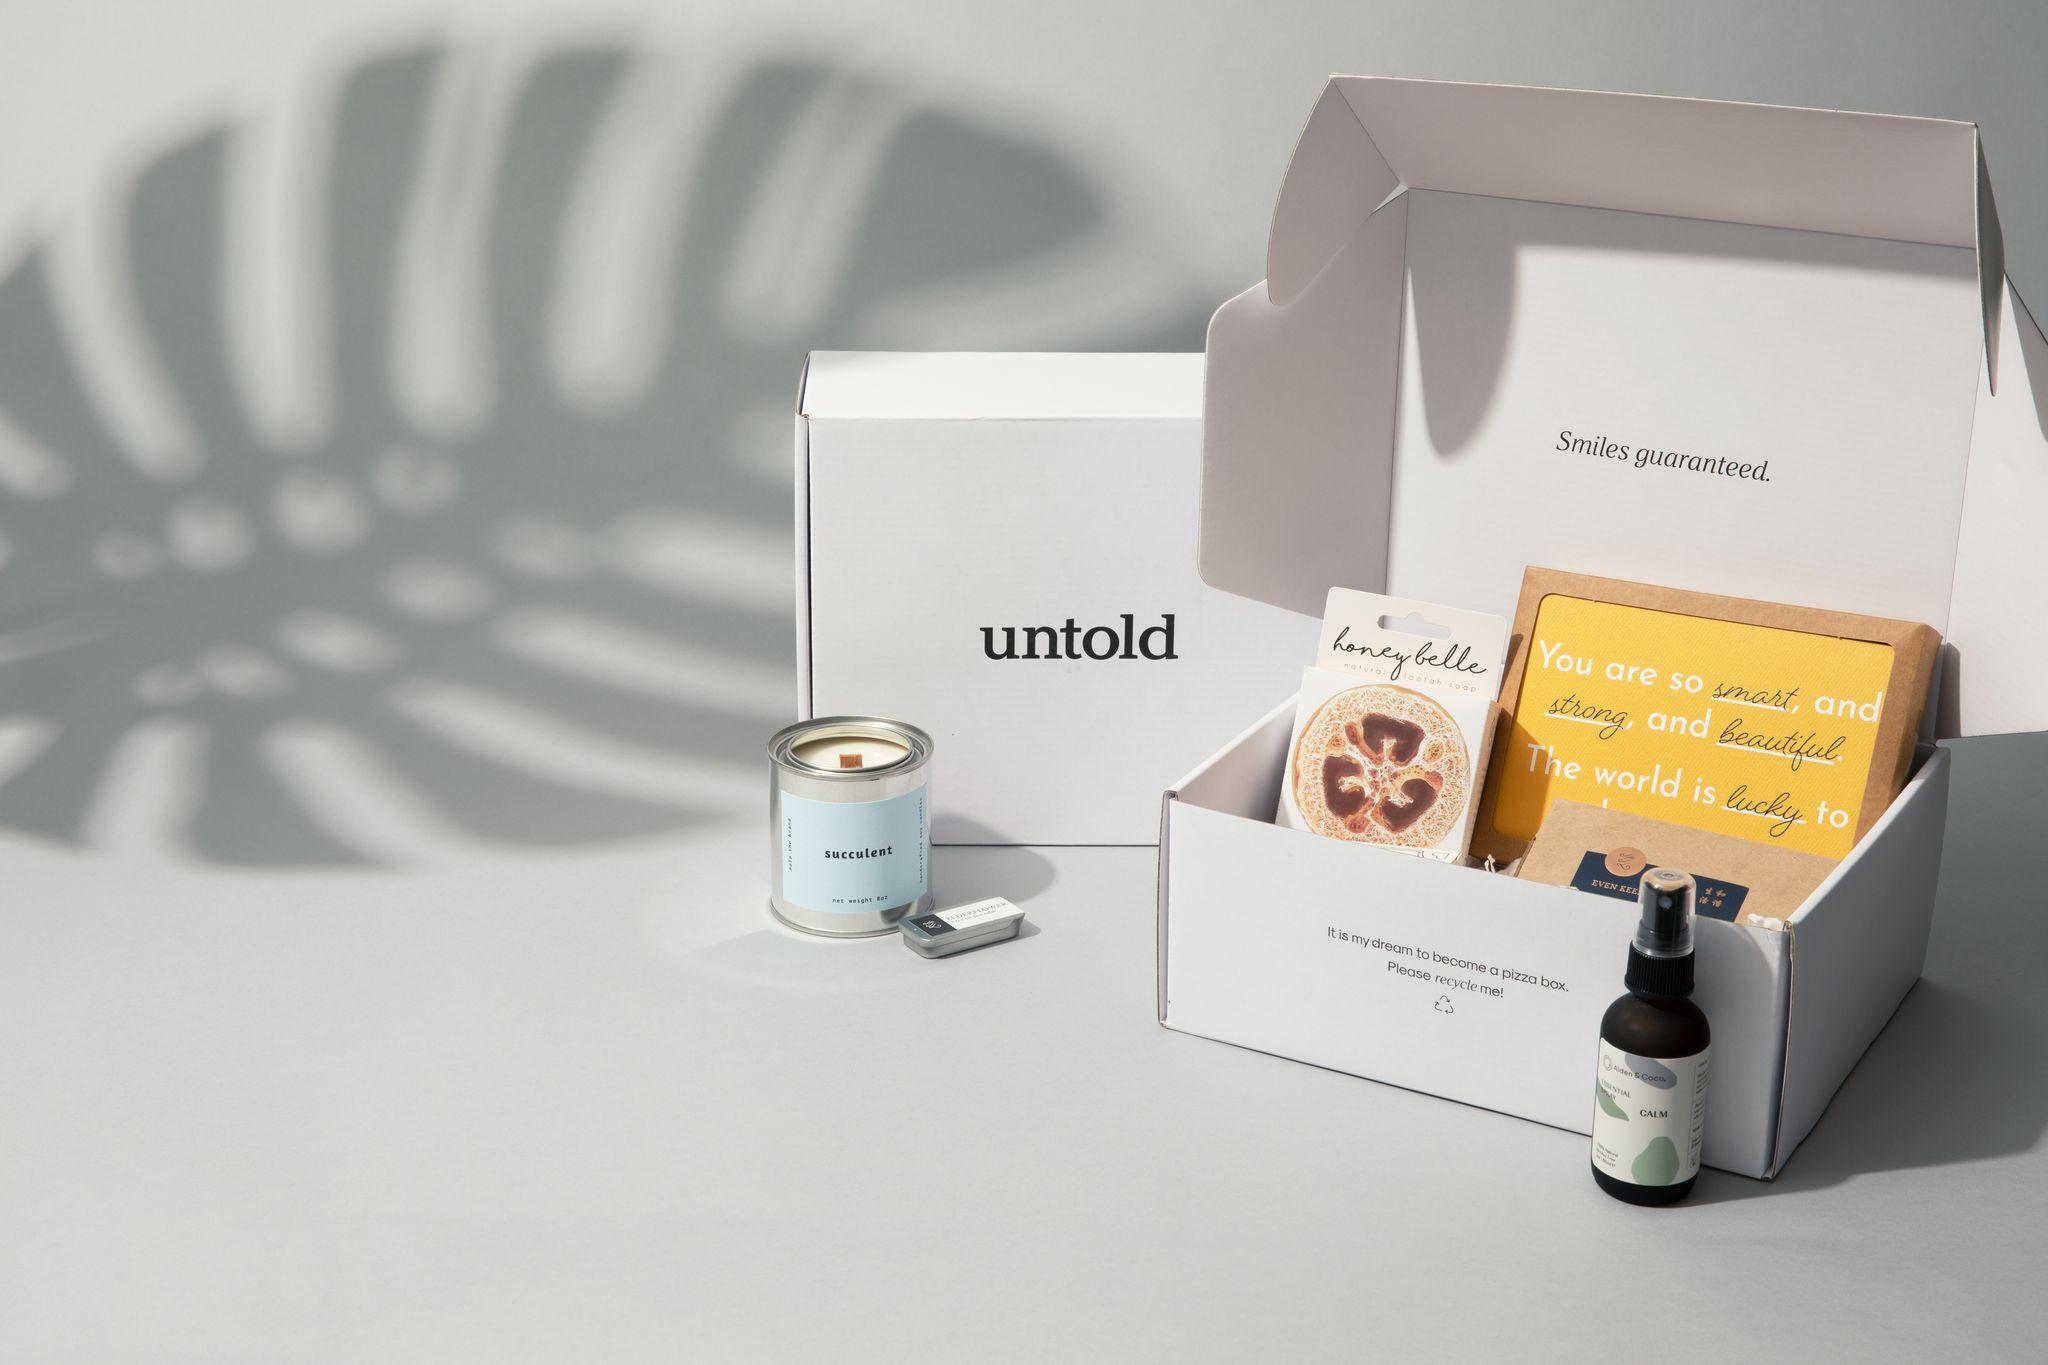 untold Custom Printed Mailer Boxes